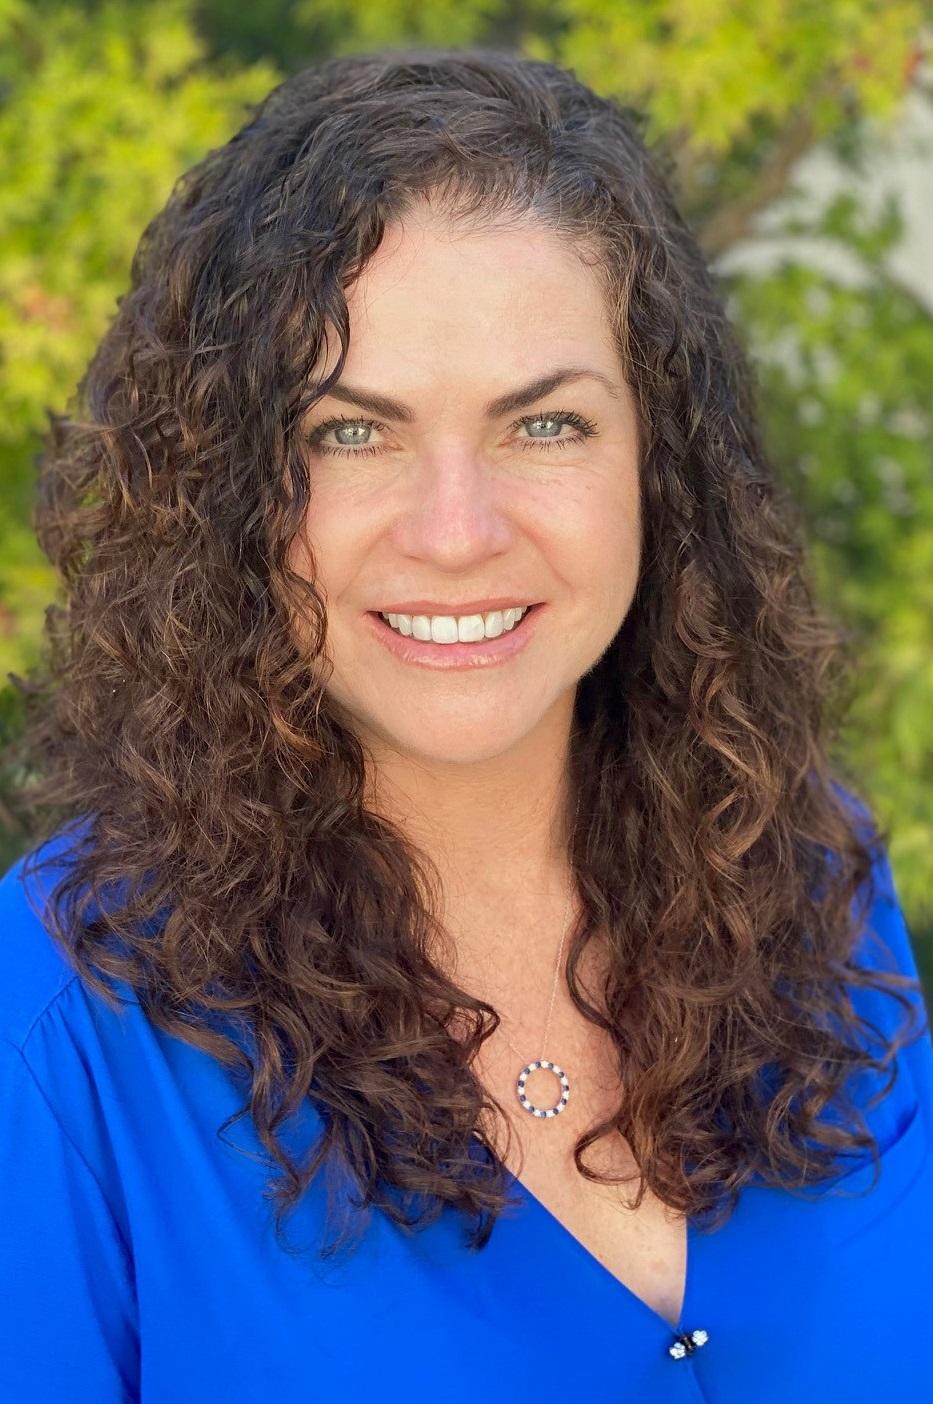 Kelly Anselmo